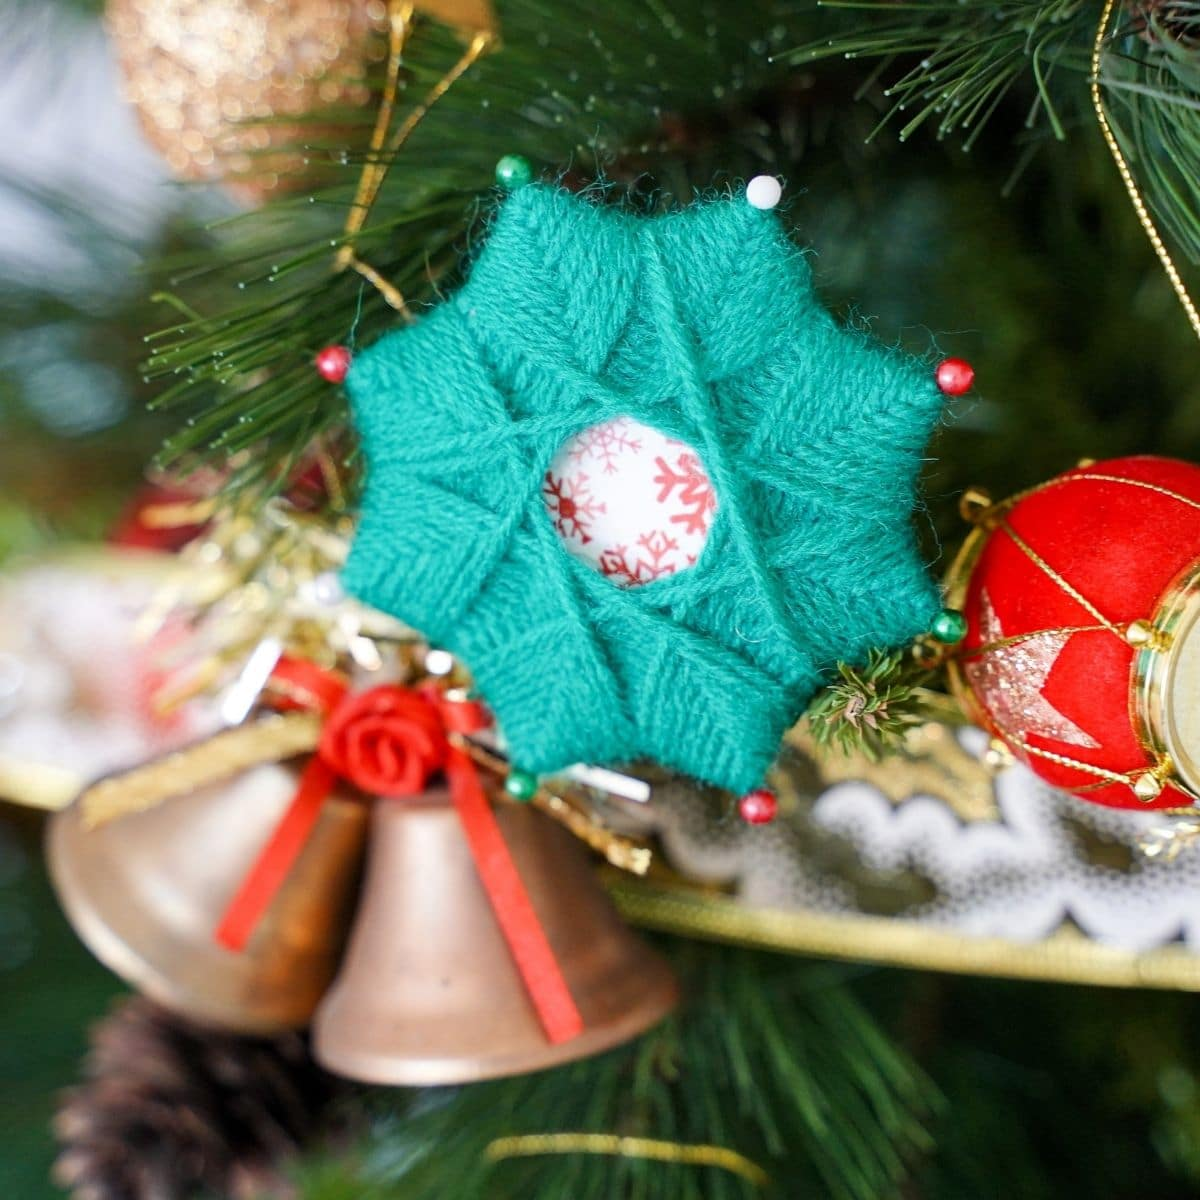 Yarn star in tree